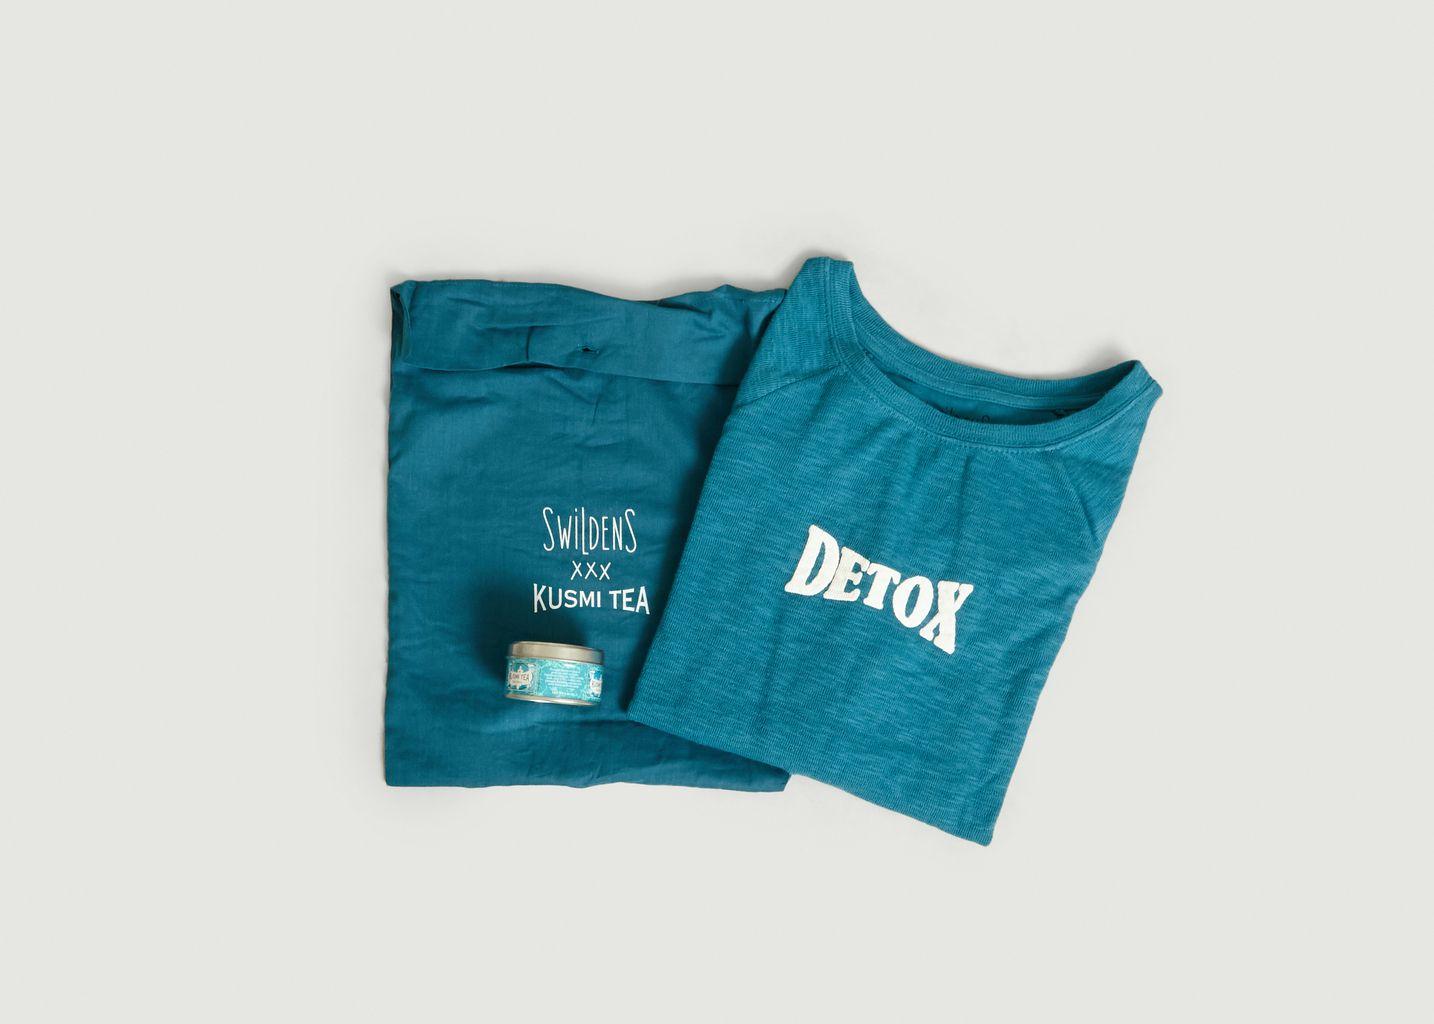 Sweat x Kusmi Tea Detox - Swildens